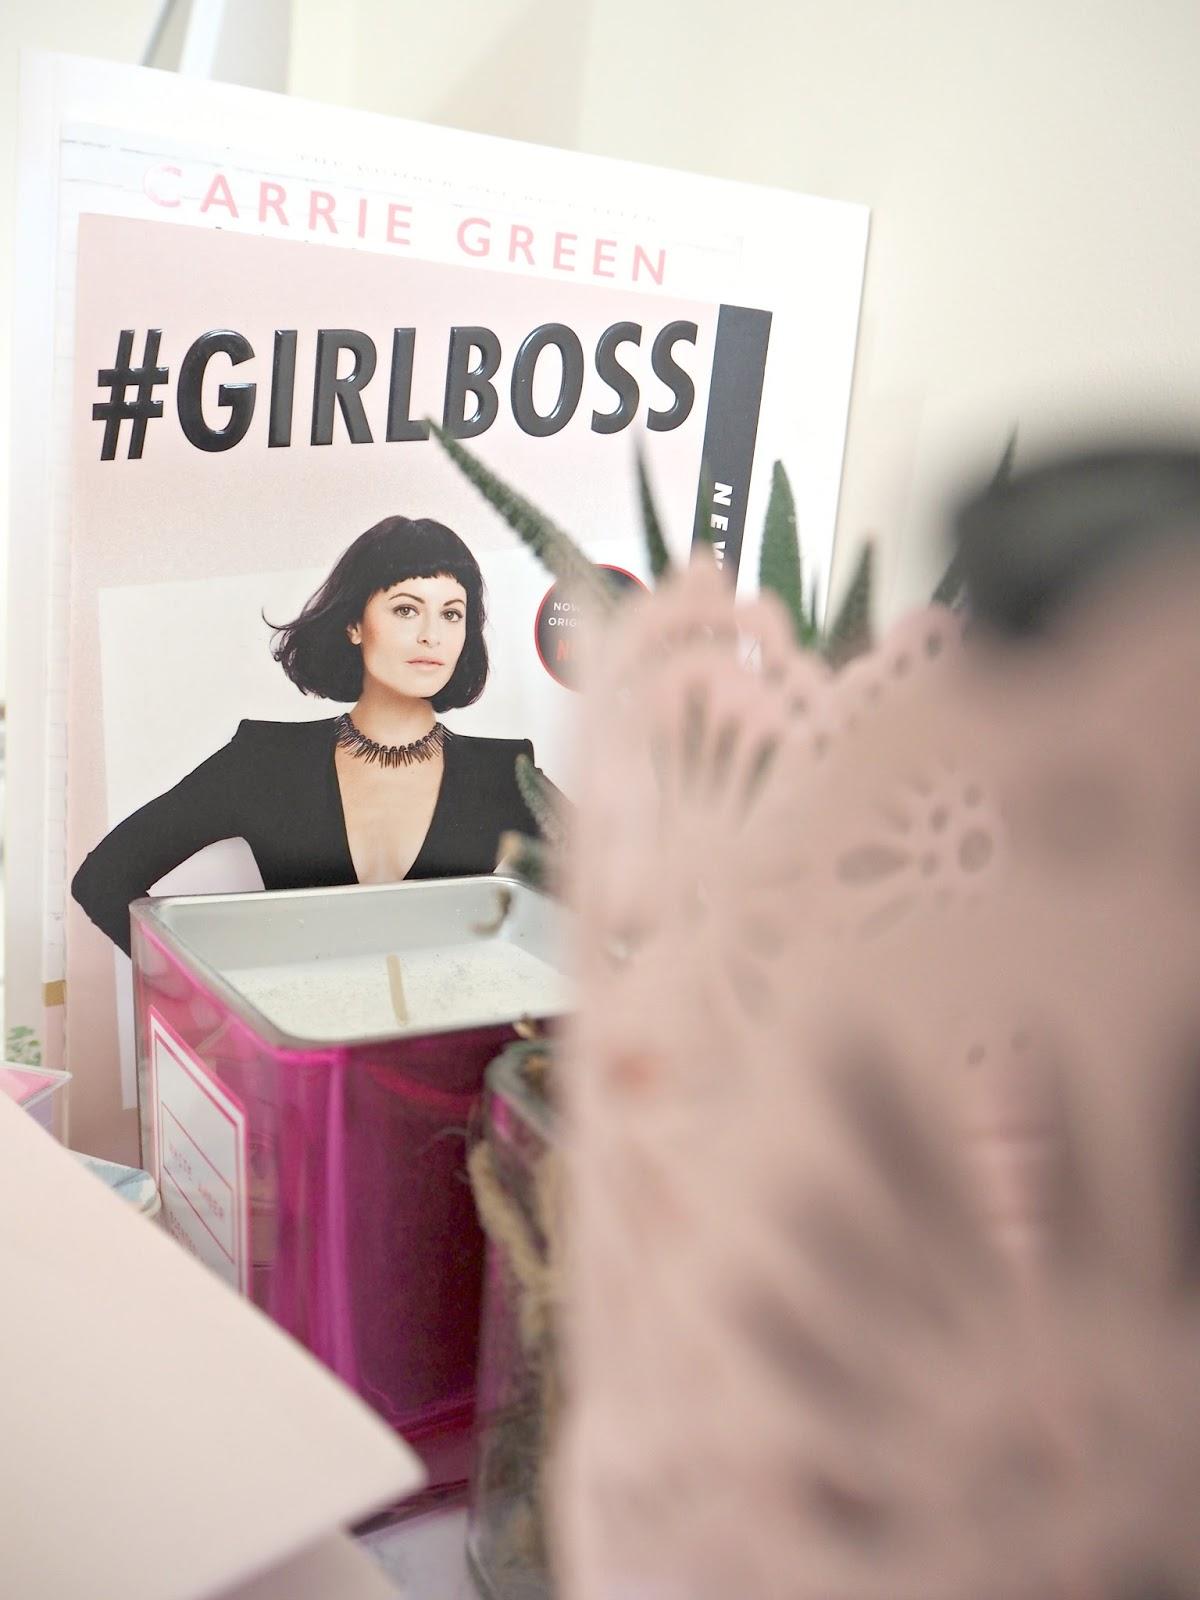 SOME NEW READING MATERIAL   #GIRLBOSS   Love, Maisie   www.lovemaisie.com